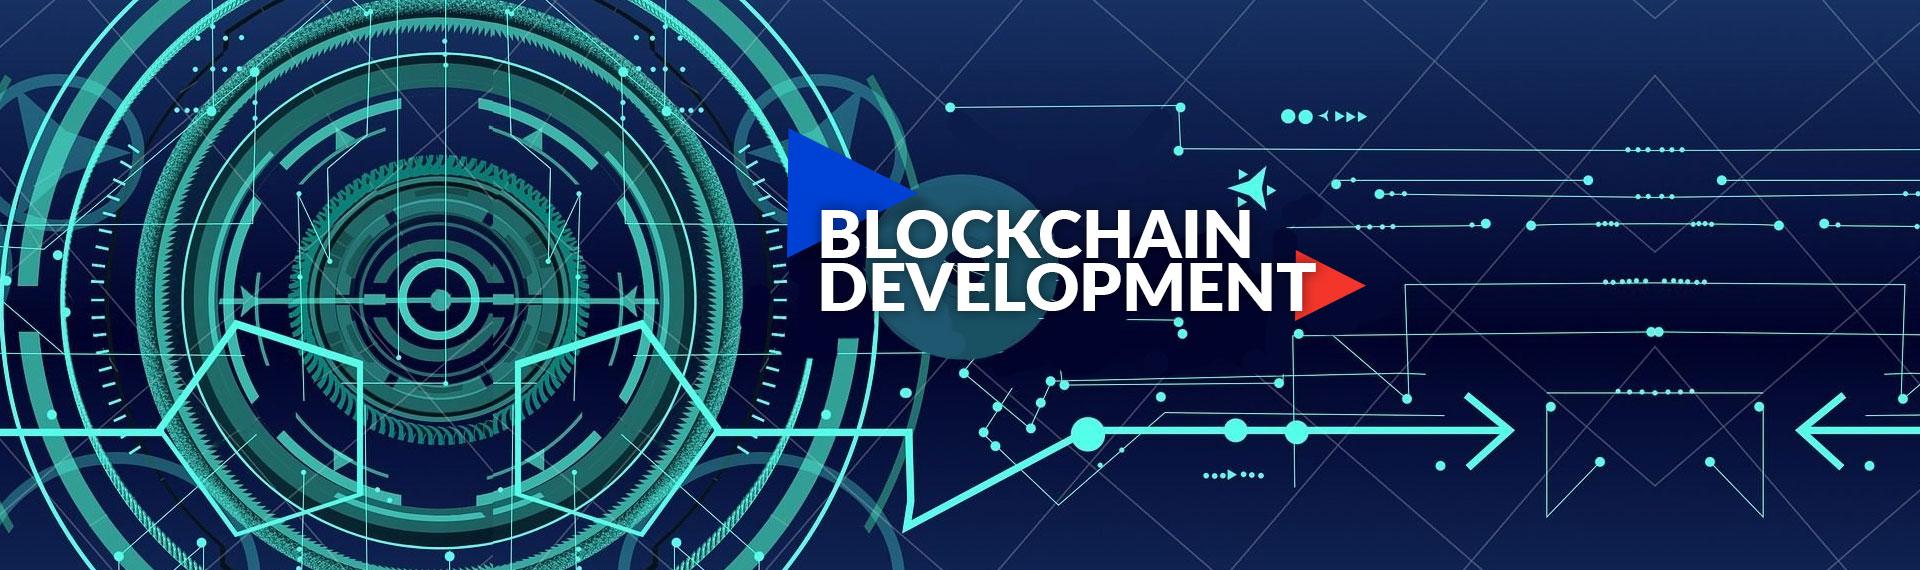 Web Development Company - DreamzTech Solutions Inc